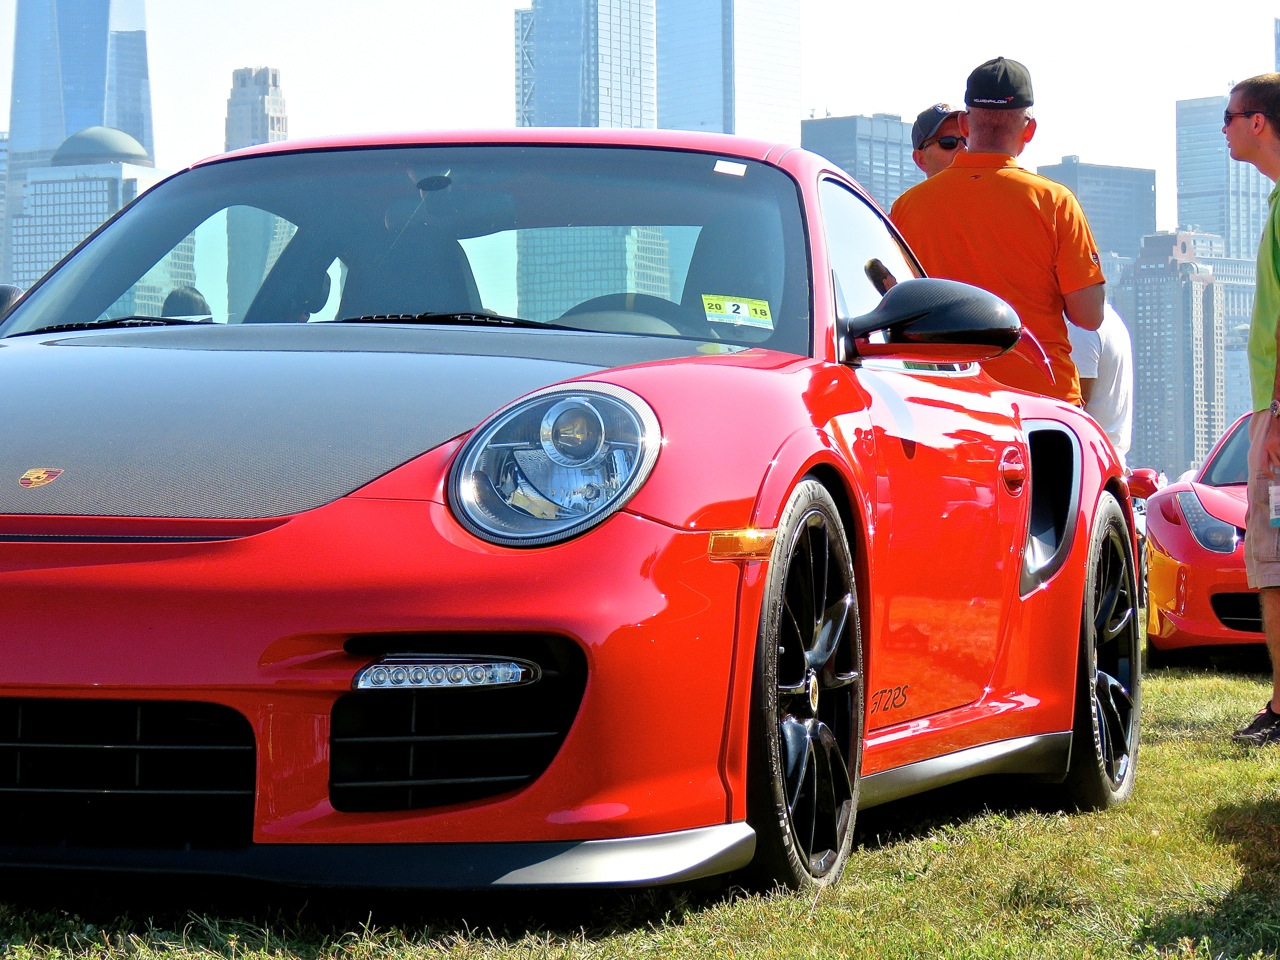 Porsche 997 GT2 RS NYC 2